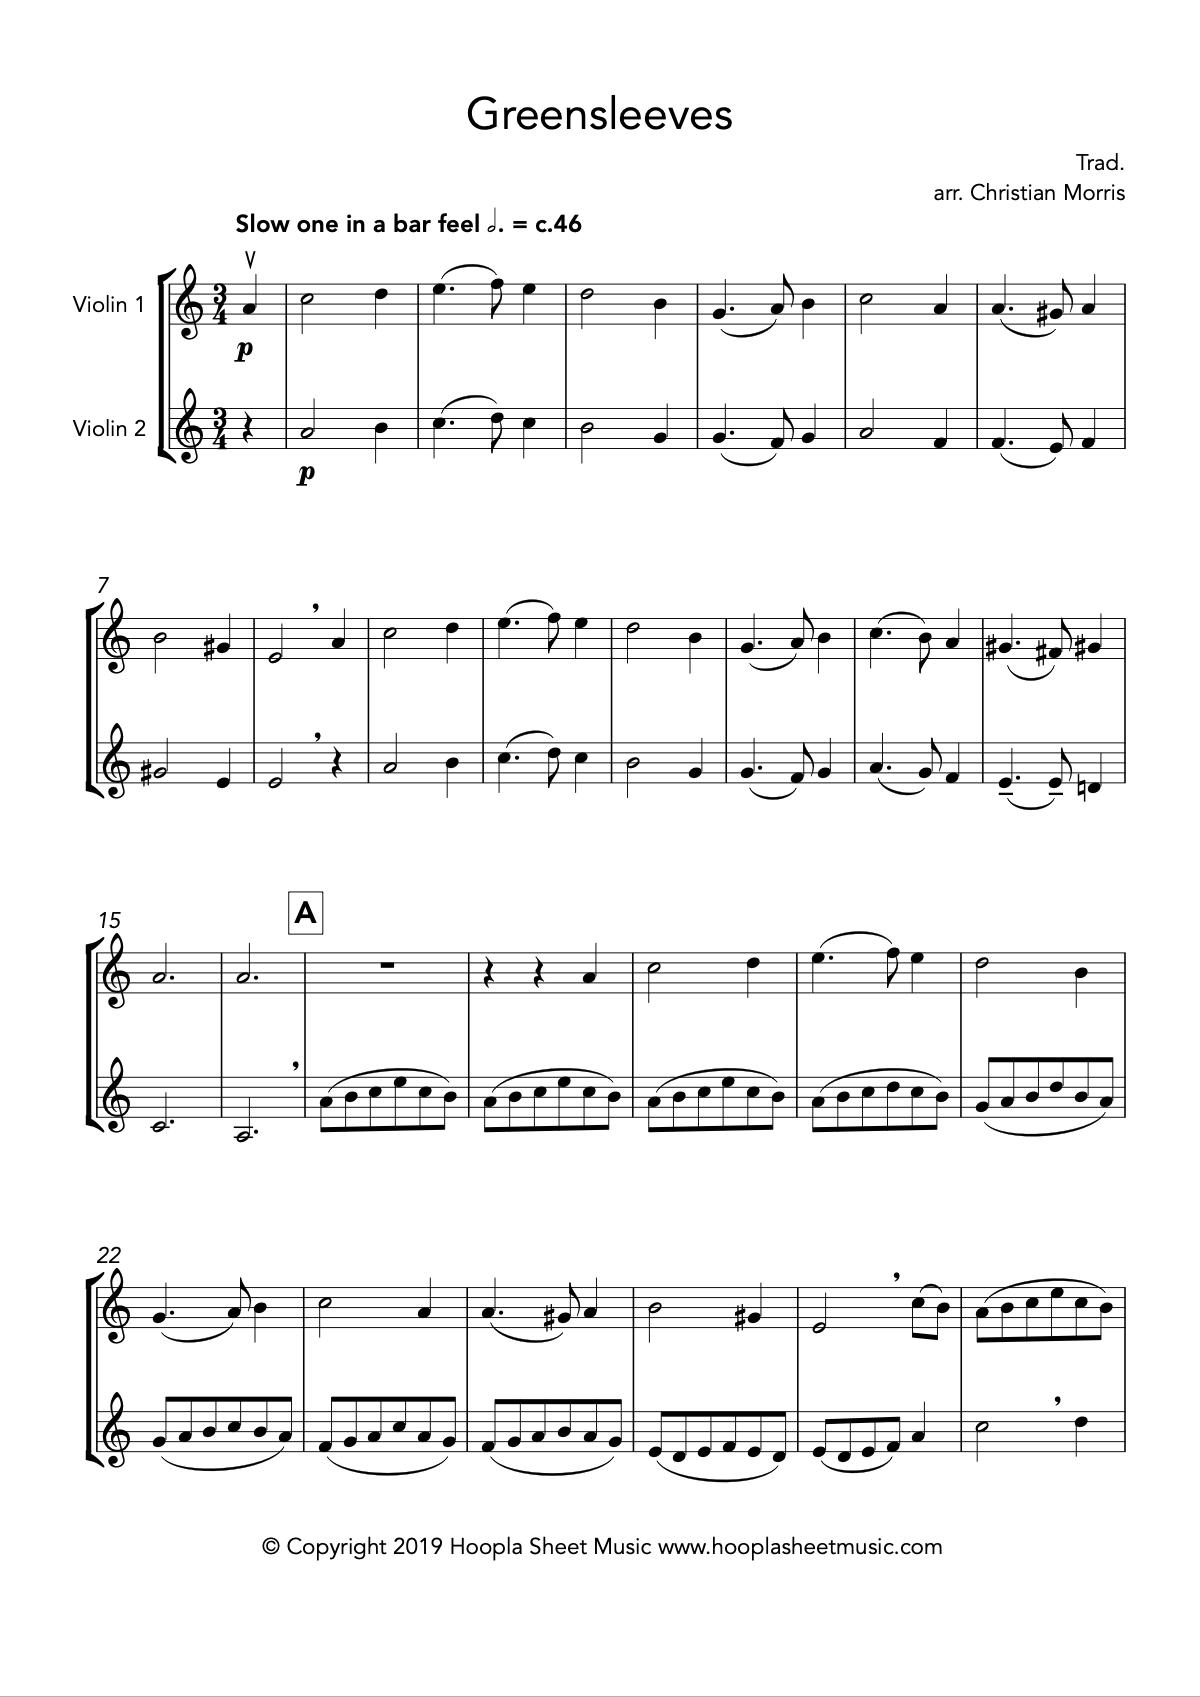 Greensleeves, fantasy for violin duet